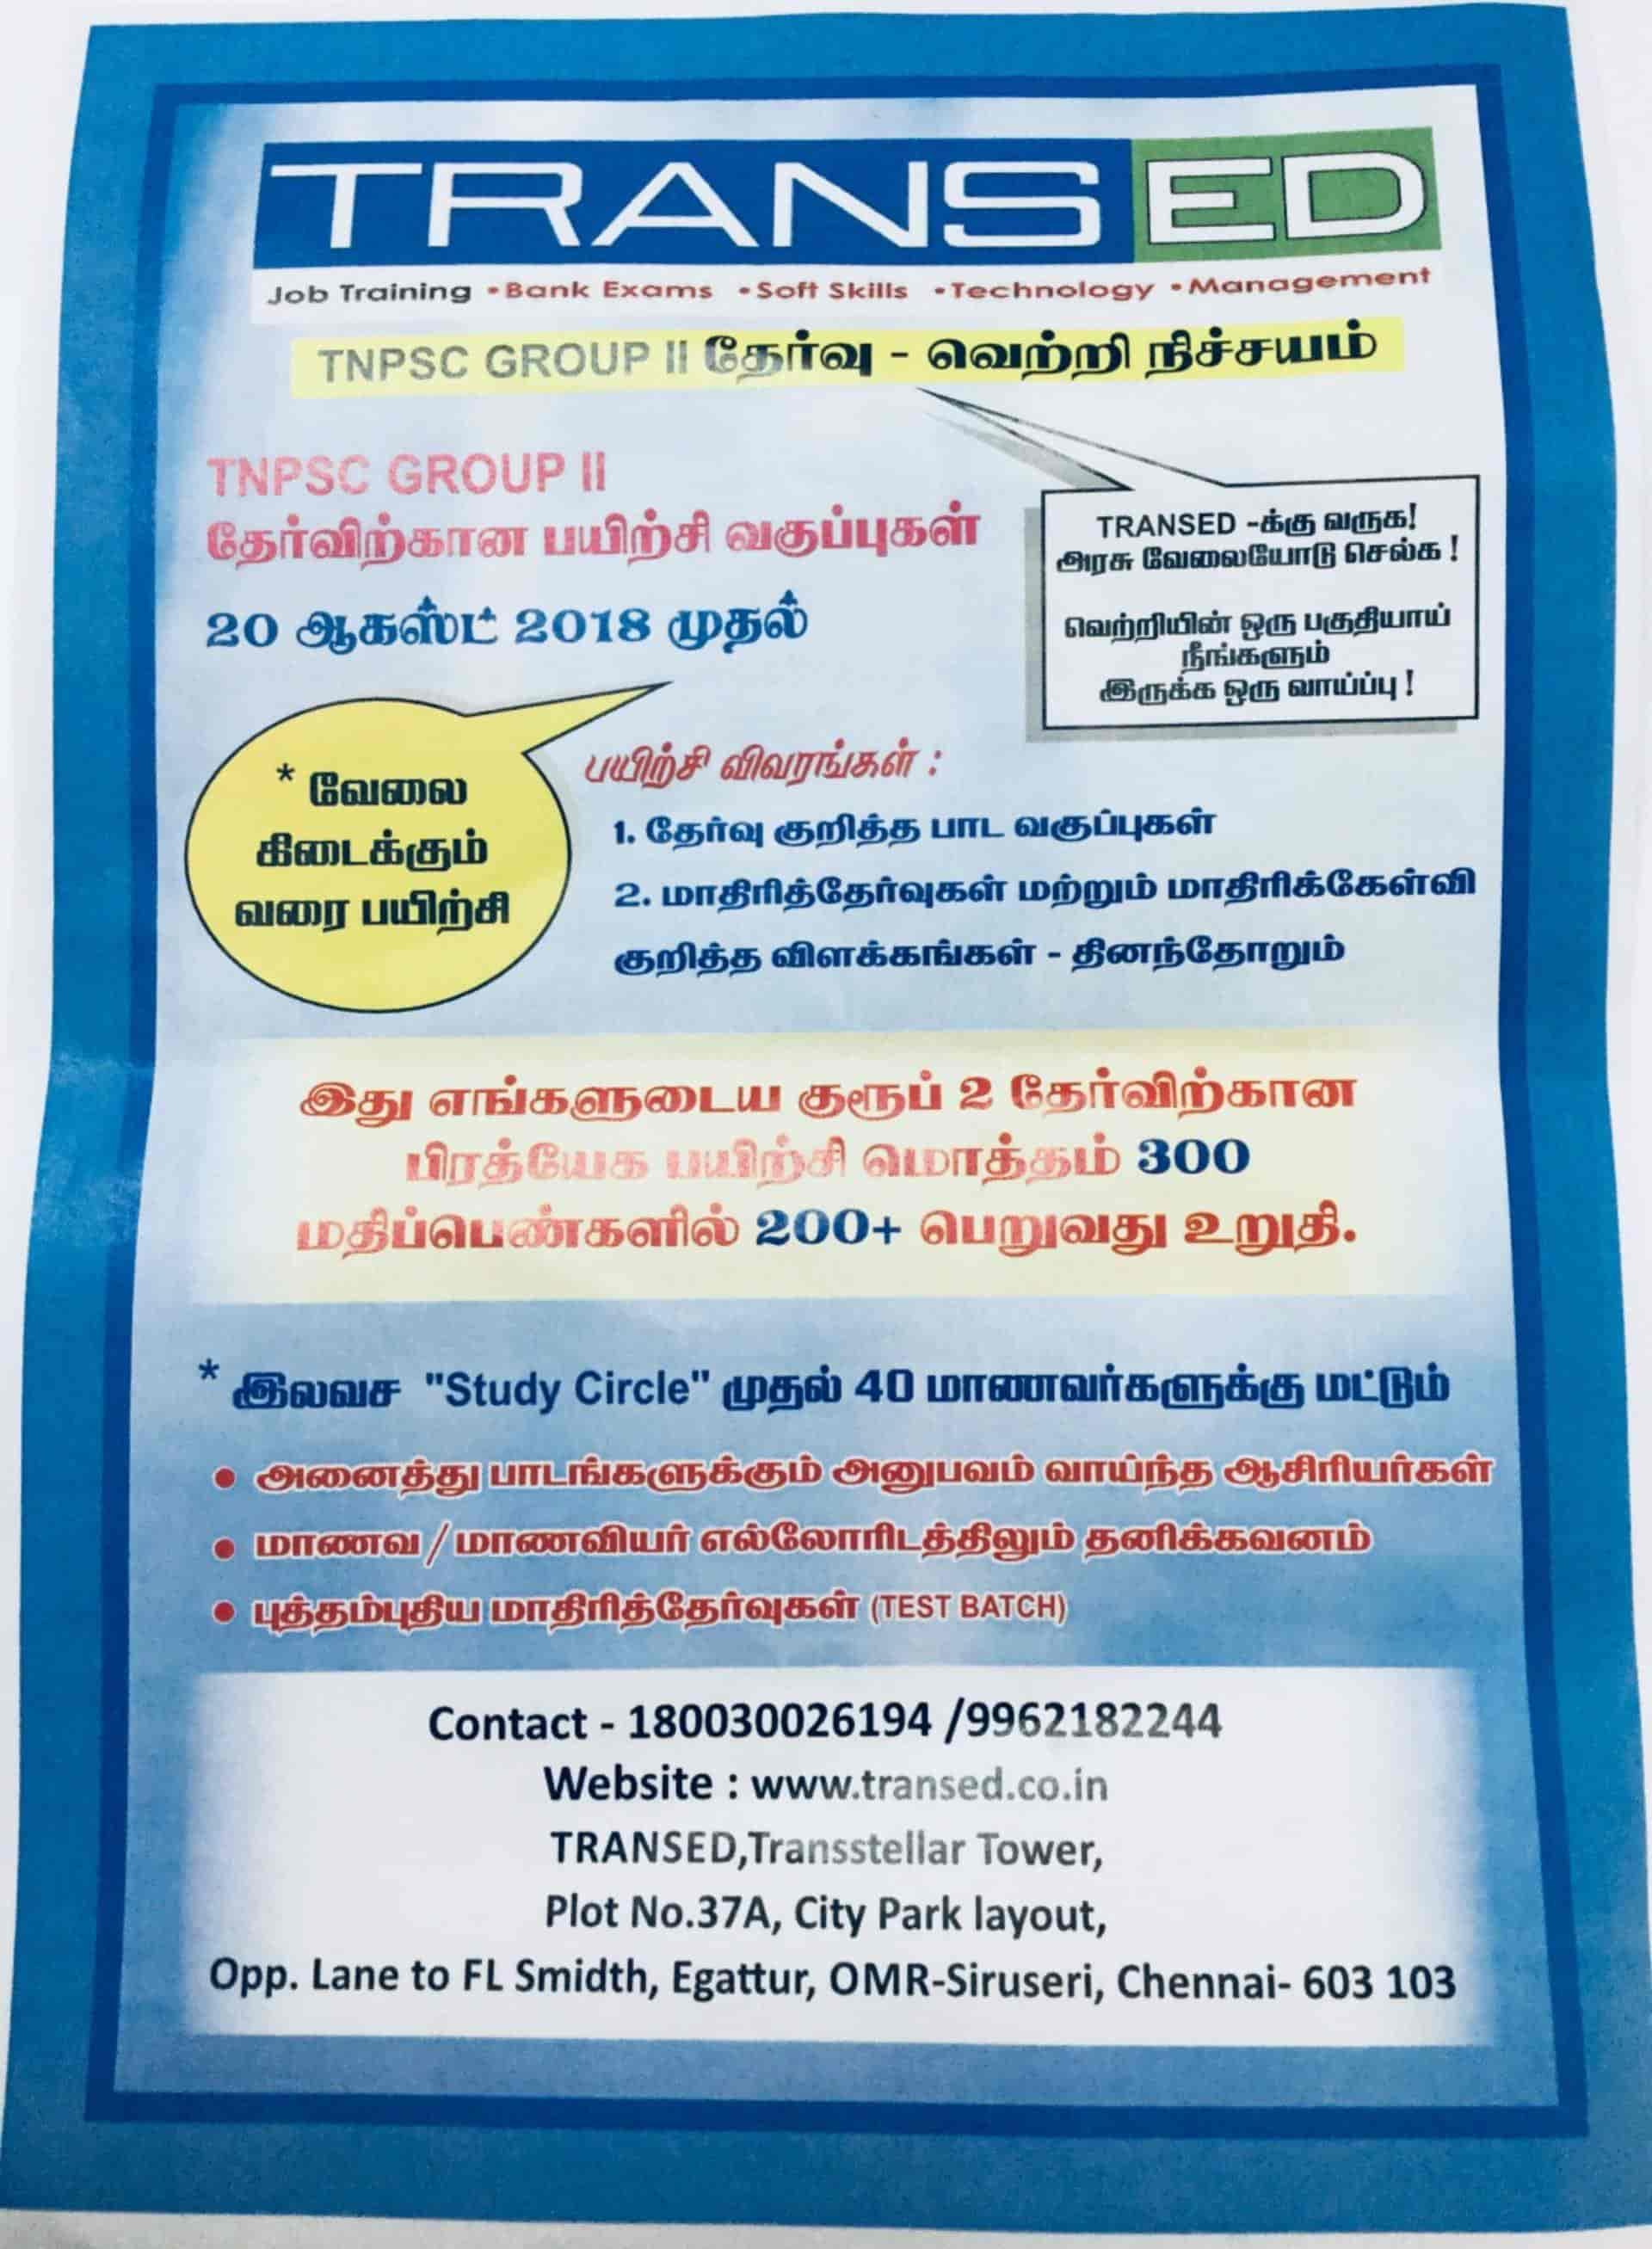 Transed Training Devasthanam Private Limited, Egattur - Rbi